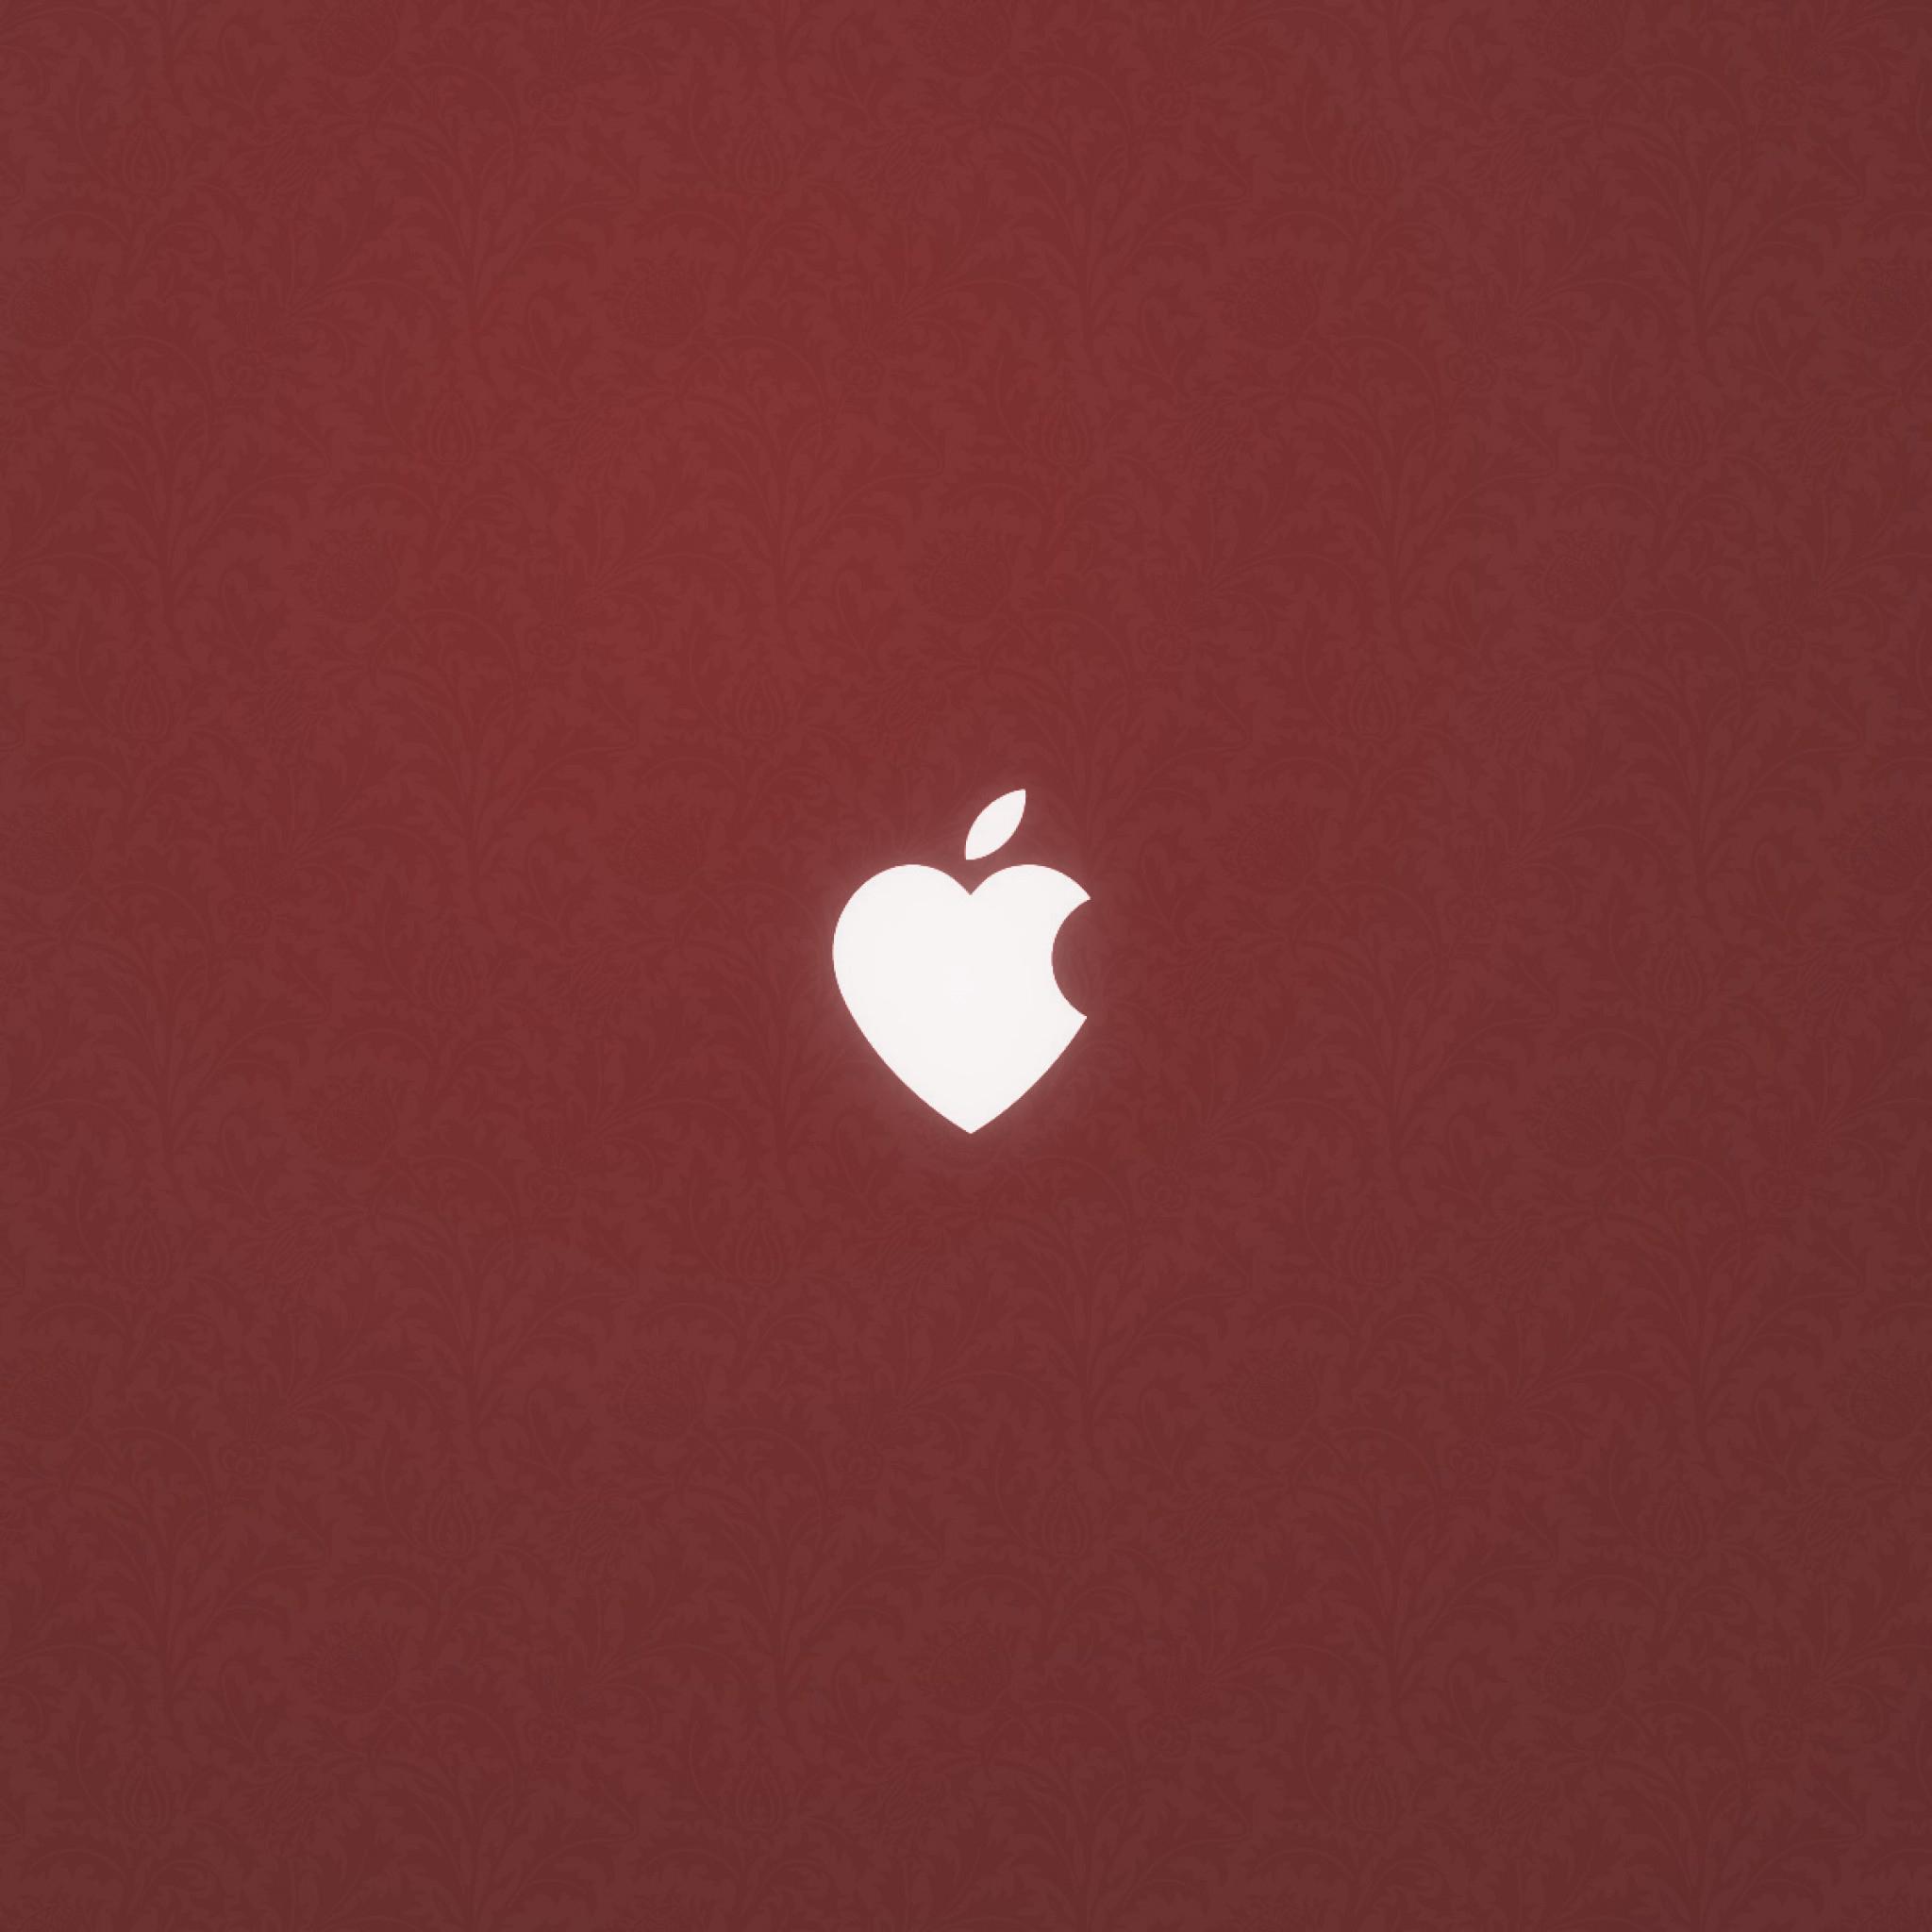 Apple Heart 3Wallpapers iPad Retina Apple Heart   iPad Retina